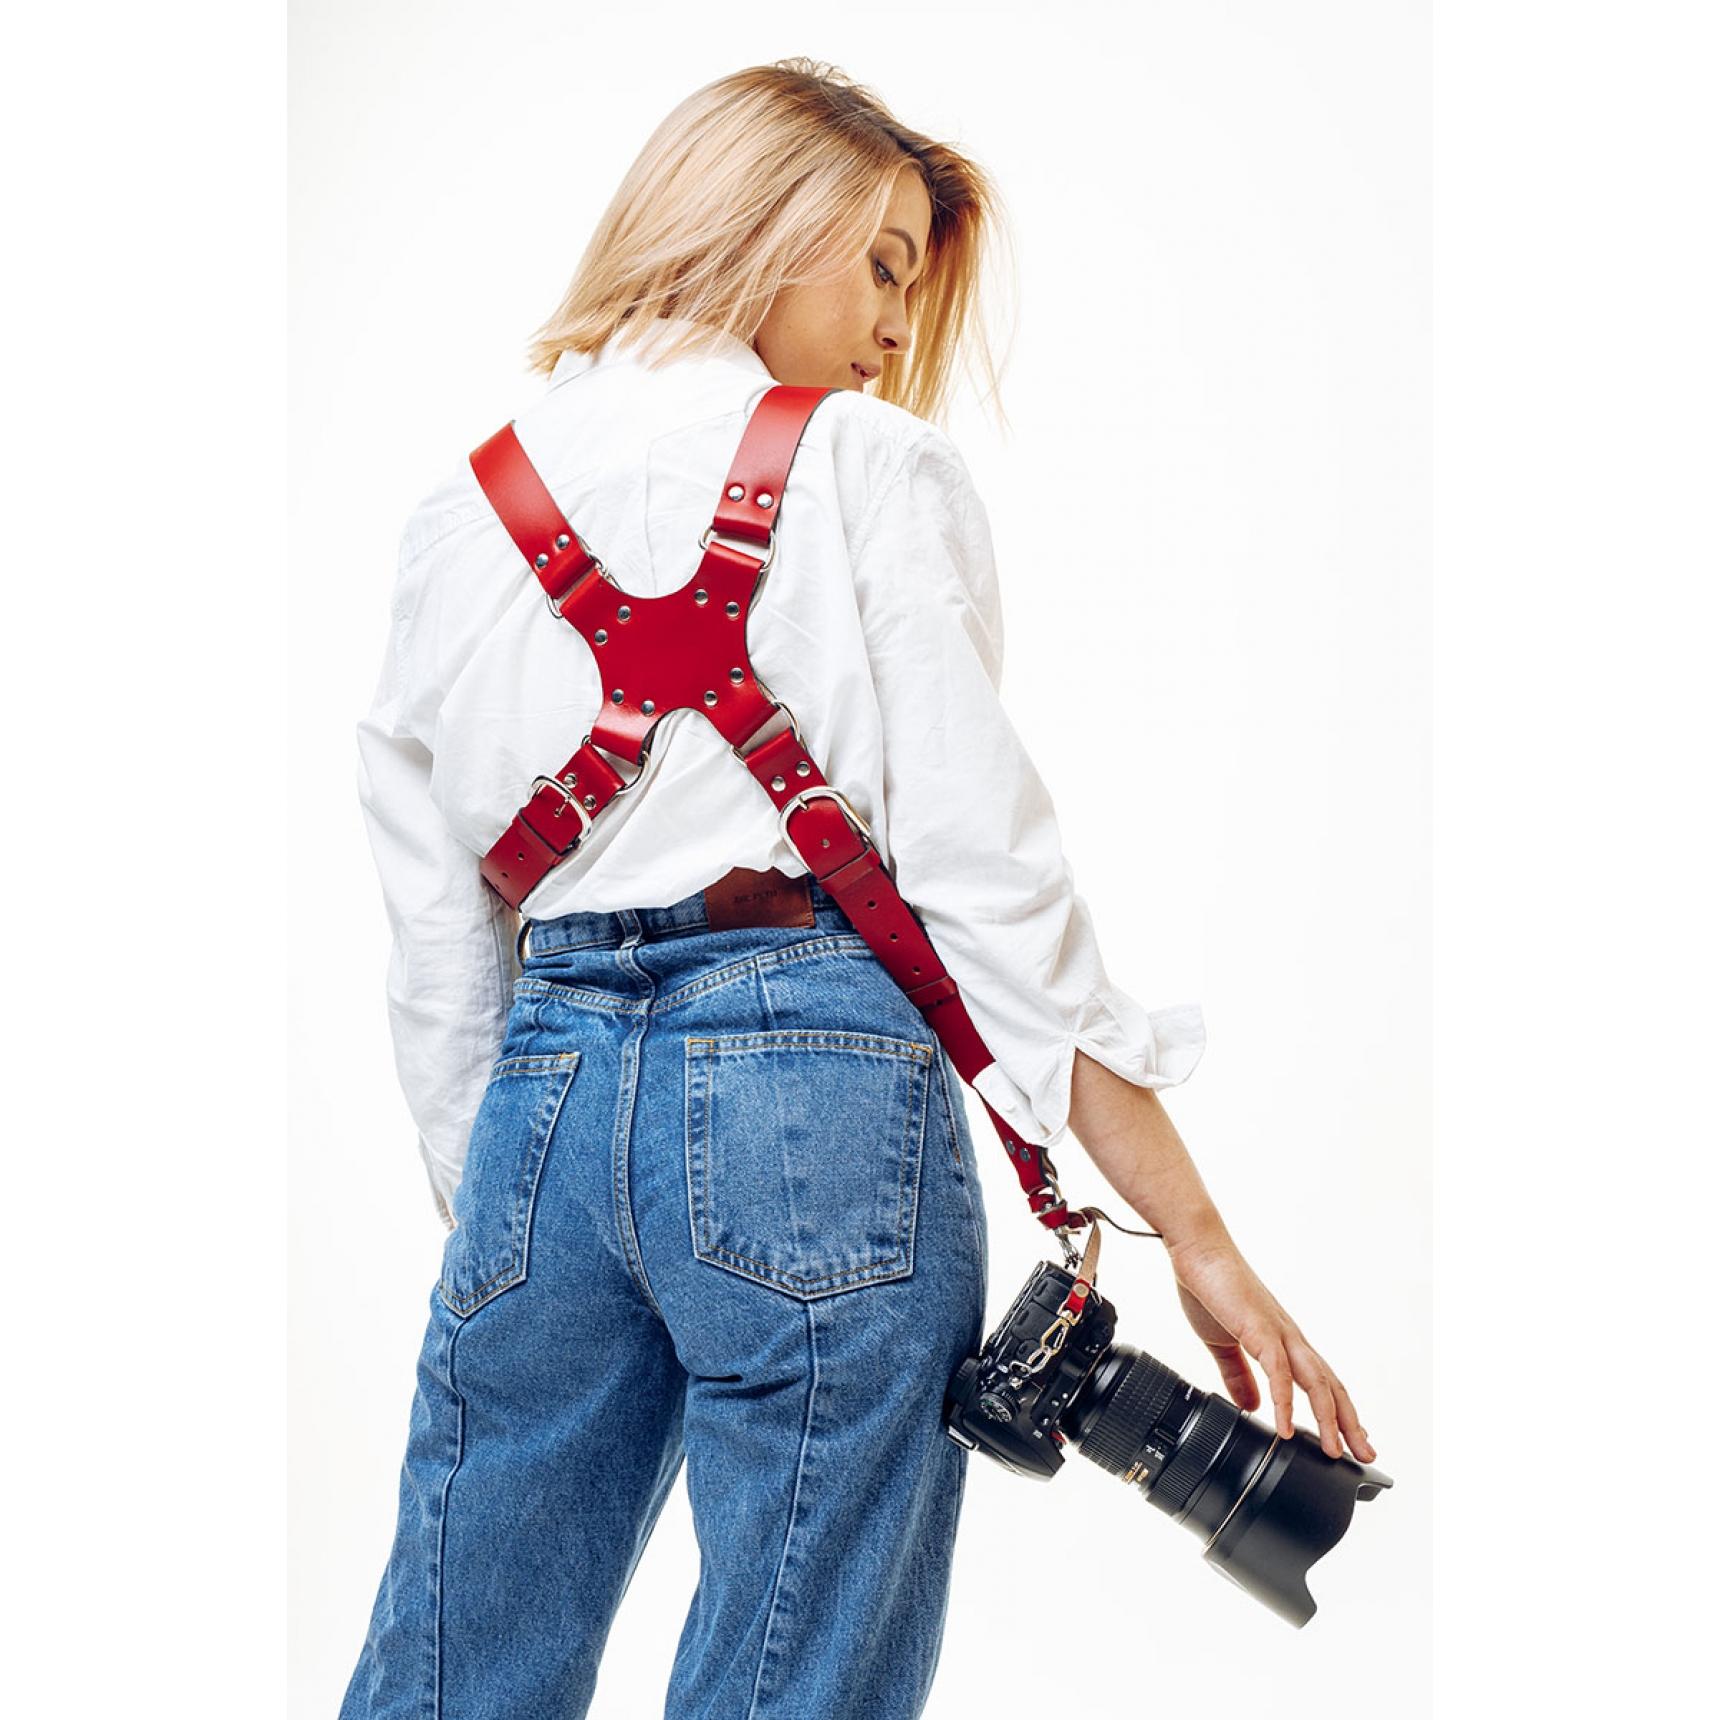 Разгрузка на 2 фотоаппарата - Модель V5.0